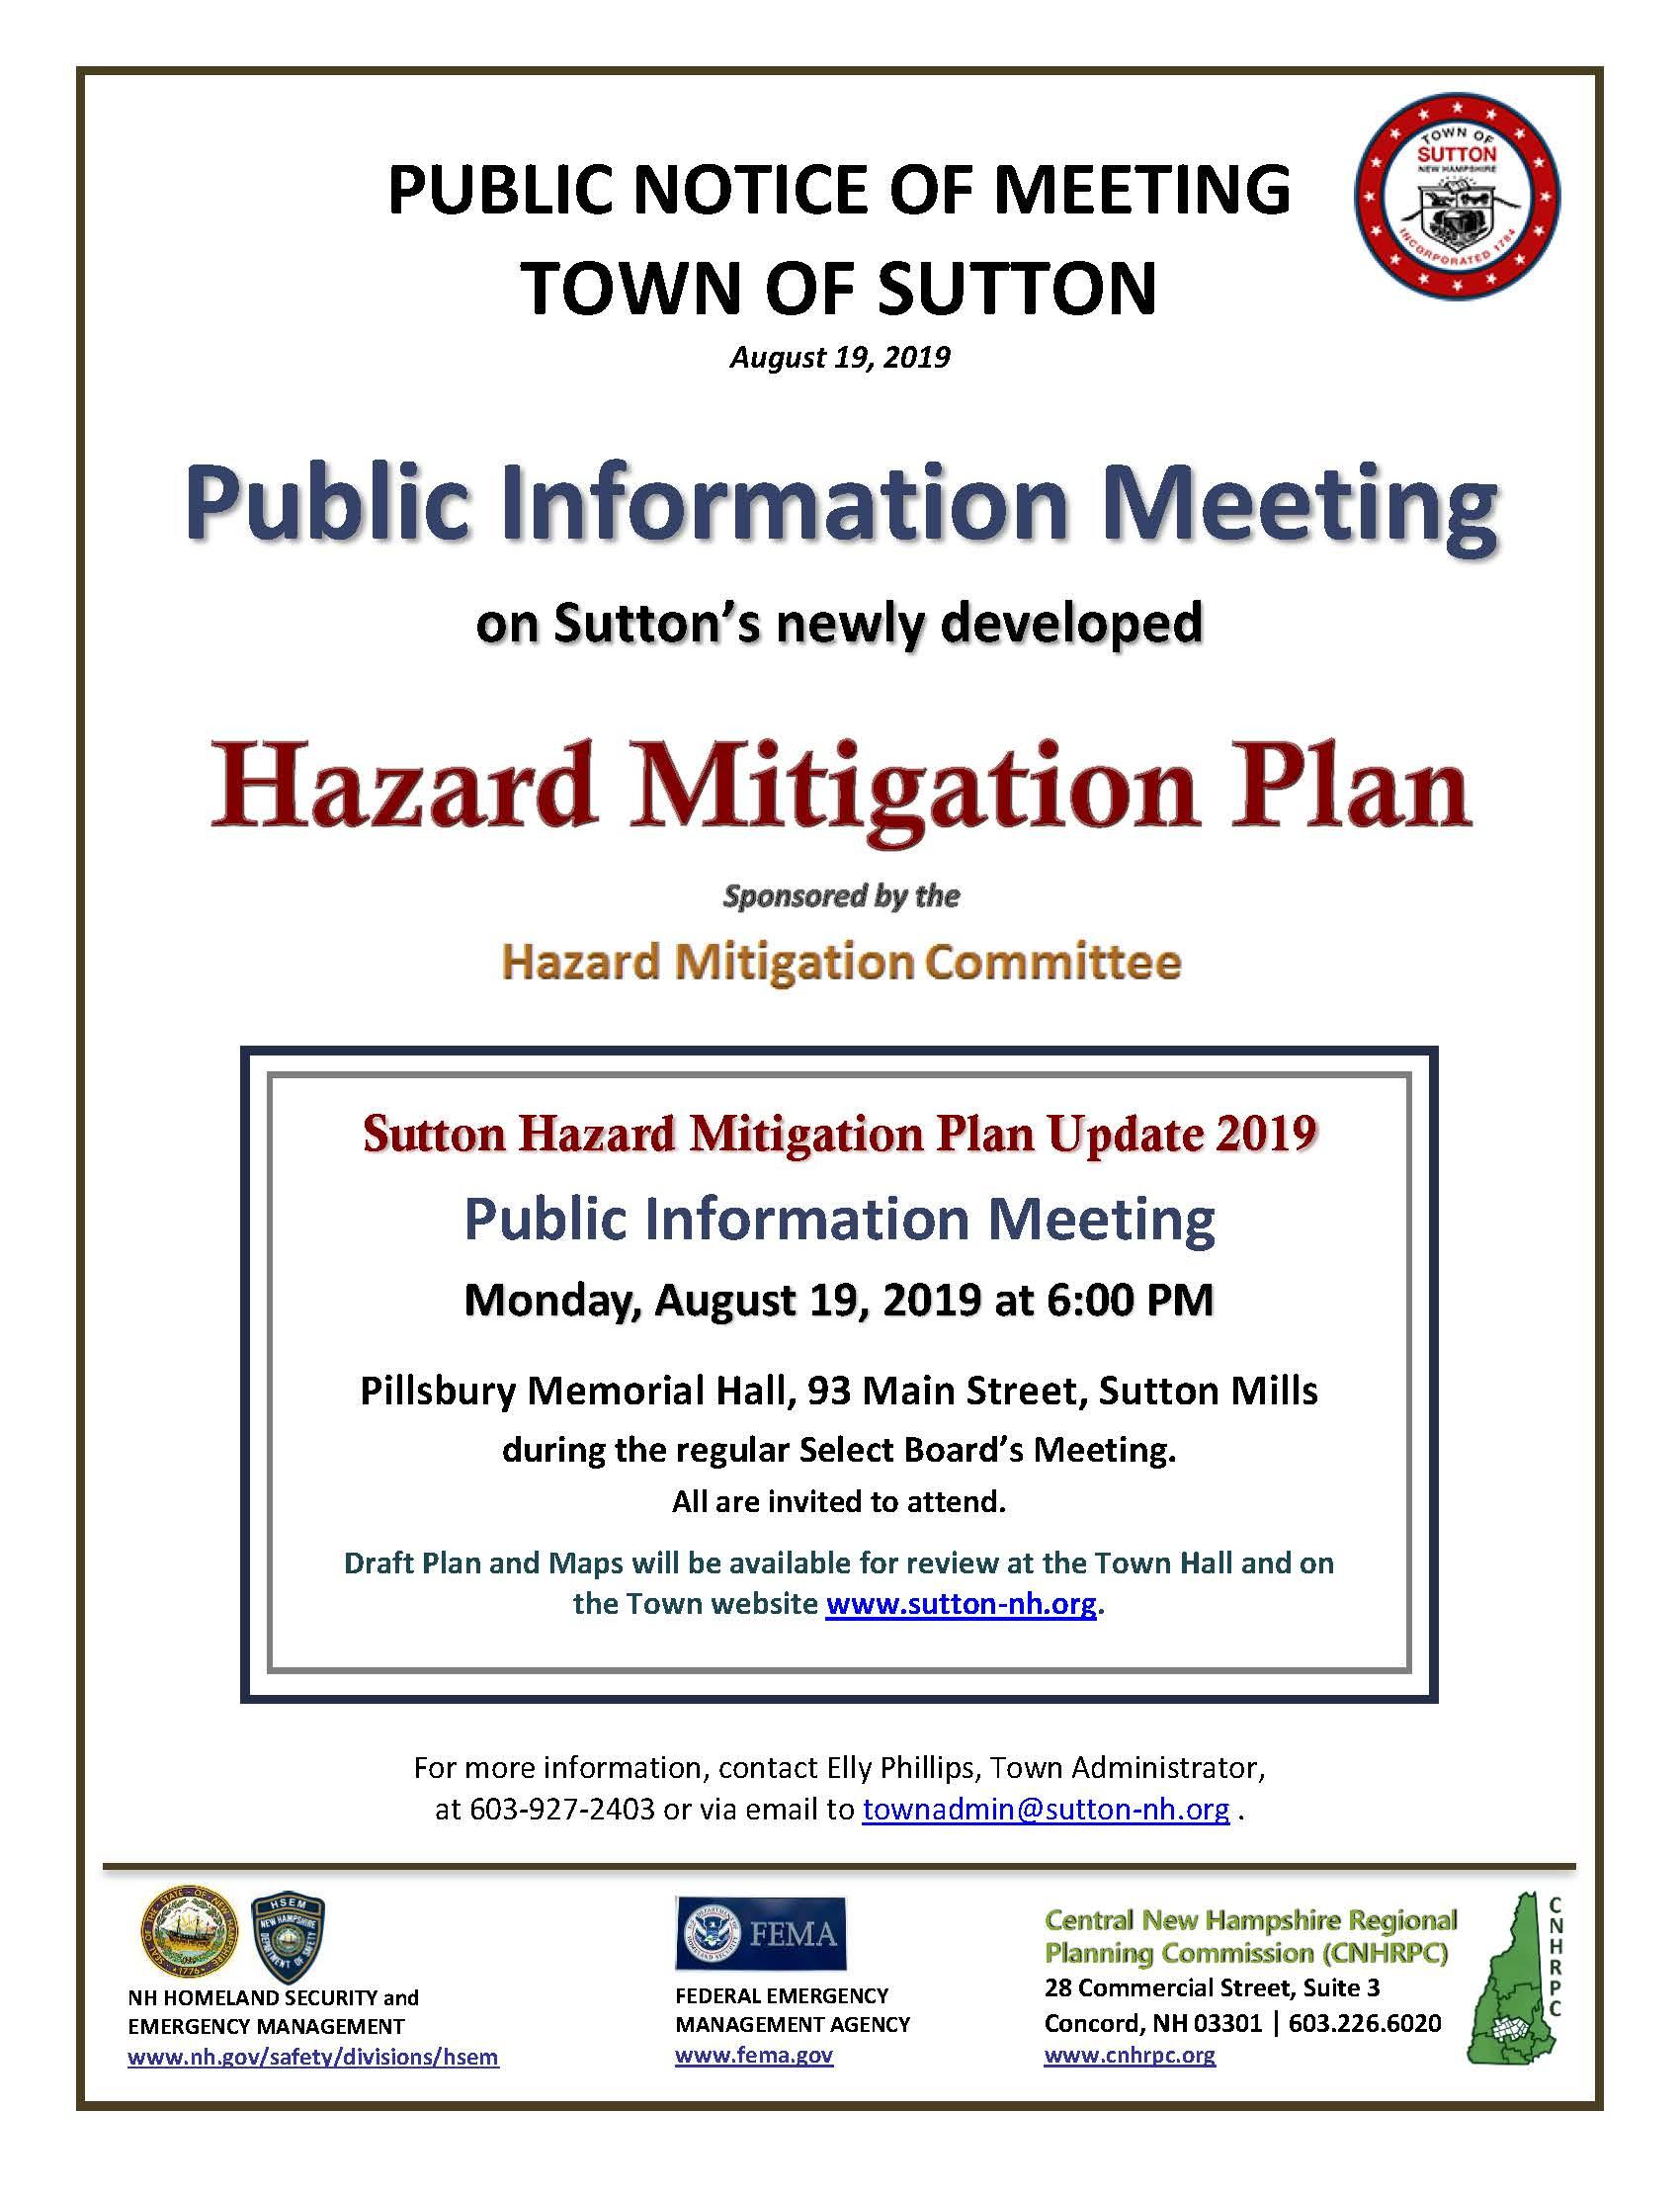 Hazard Mitigation Plan Public Information Meeting @ Pillsbury Memorial Hall | Bradford | New Hampshire | United States